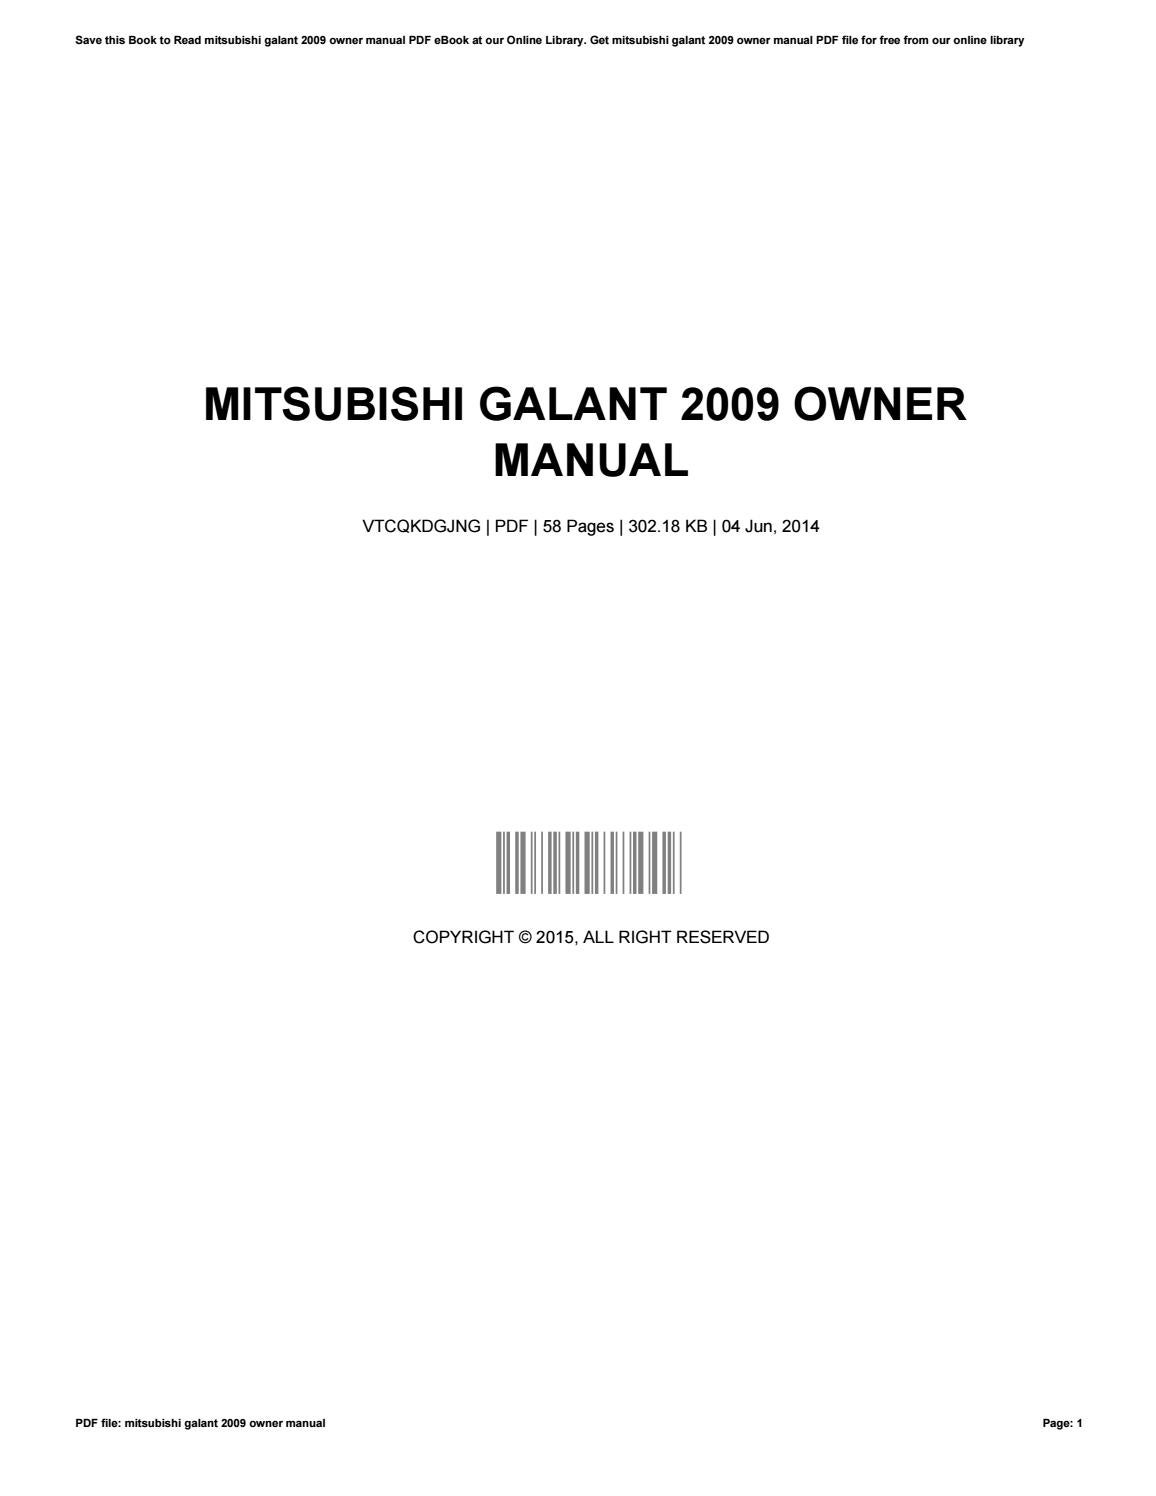 mitsubishi galant  owner manual  madonnaweaver